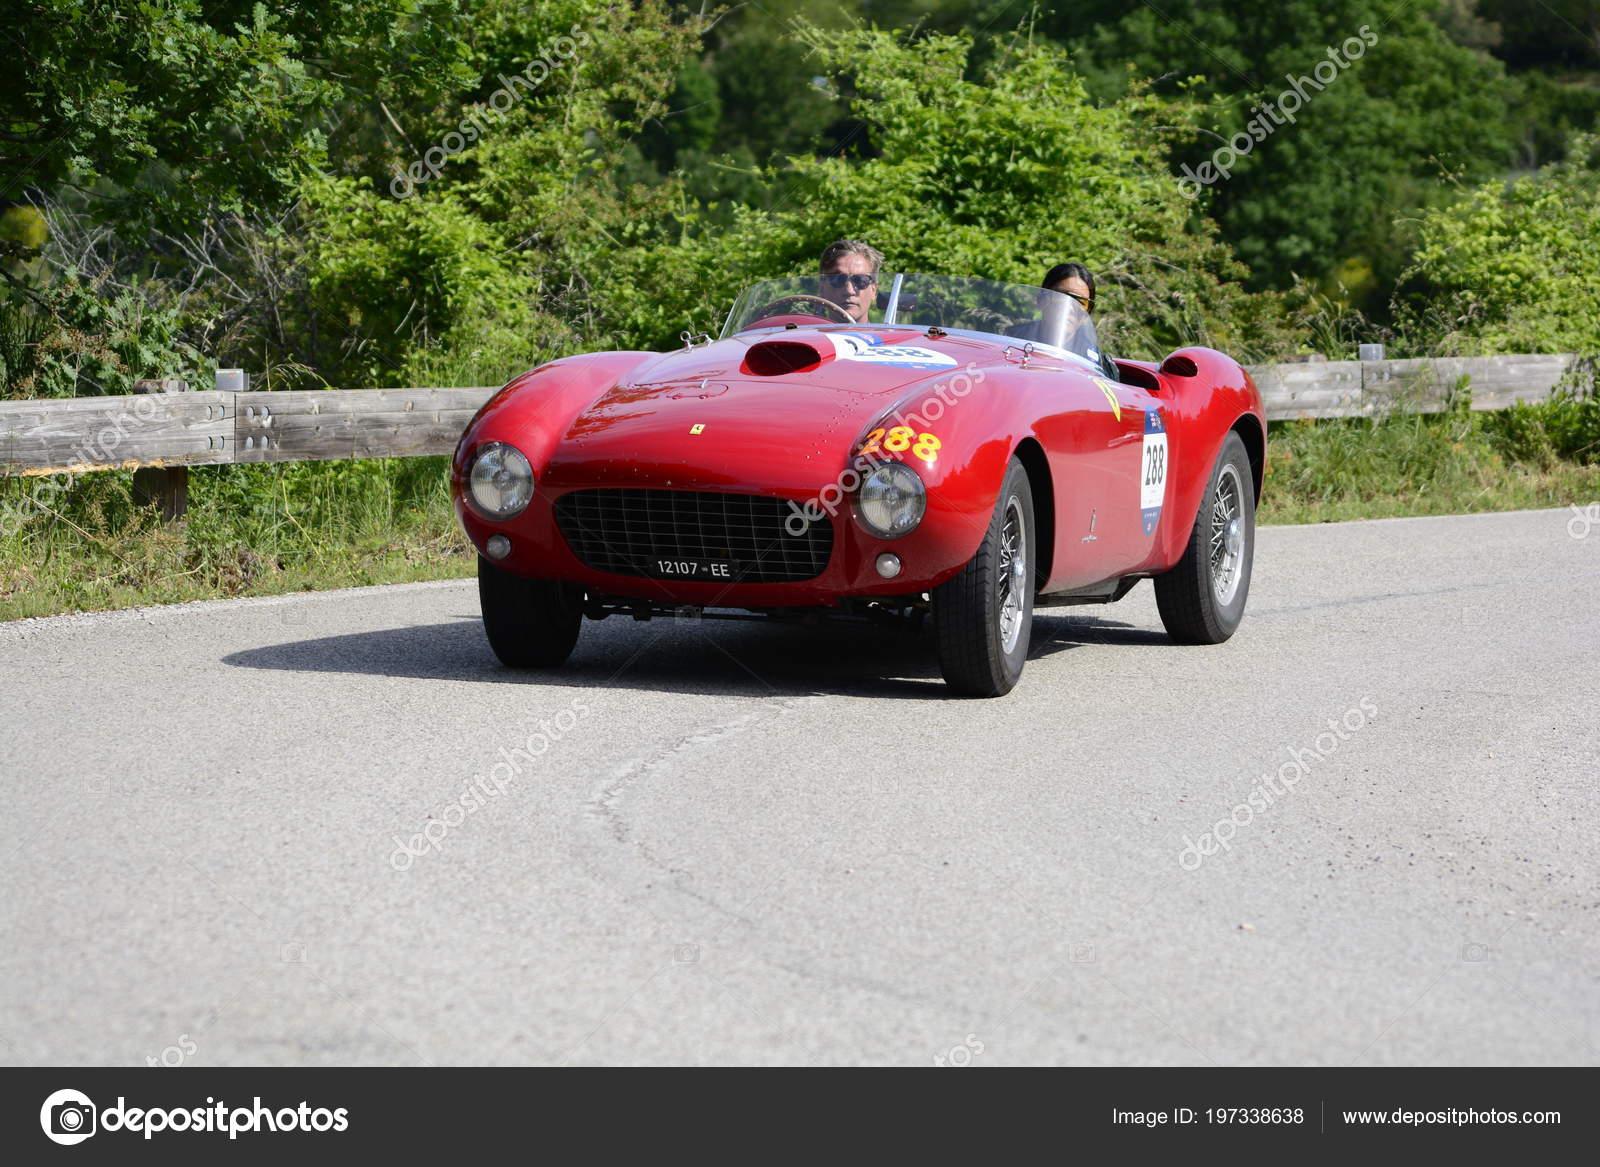 Pesaro Colle San Bartolo Italy May 2018 Ferrari 375 Spider Stock Editorial Photo C Massimocampa 197338638